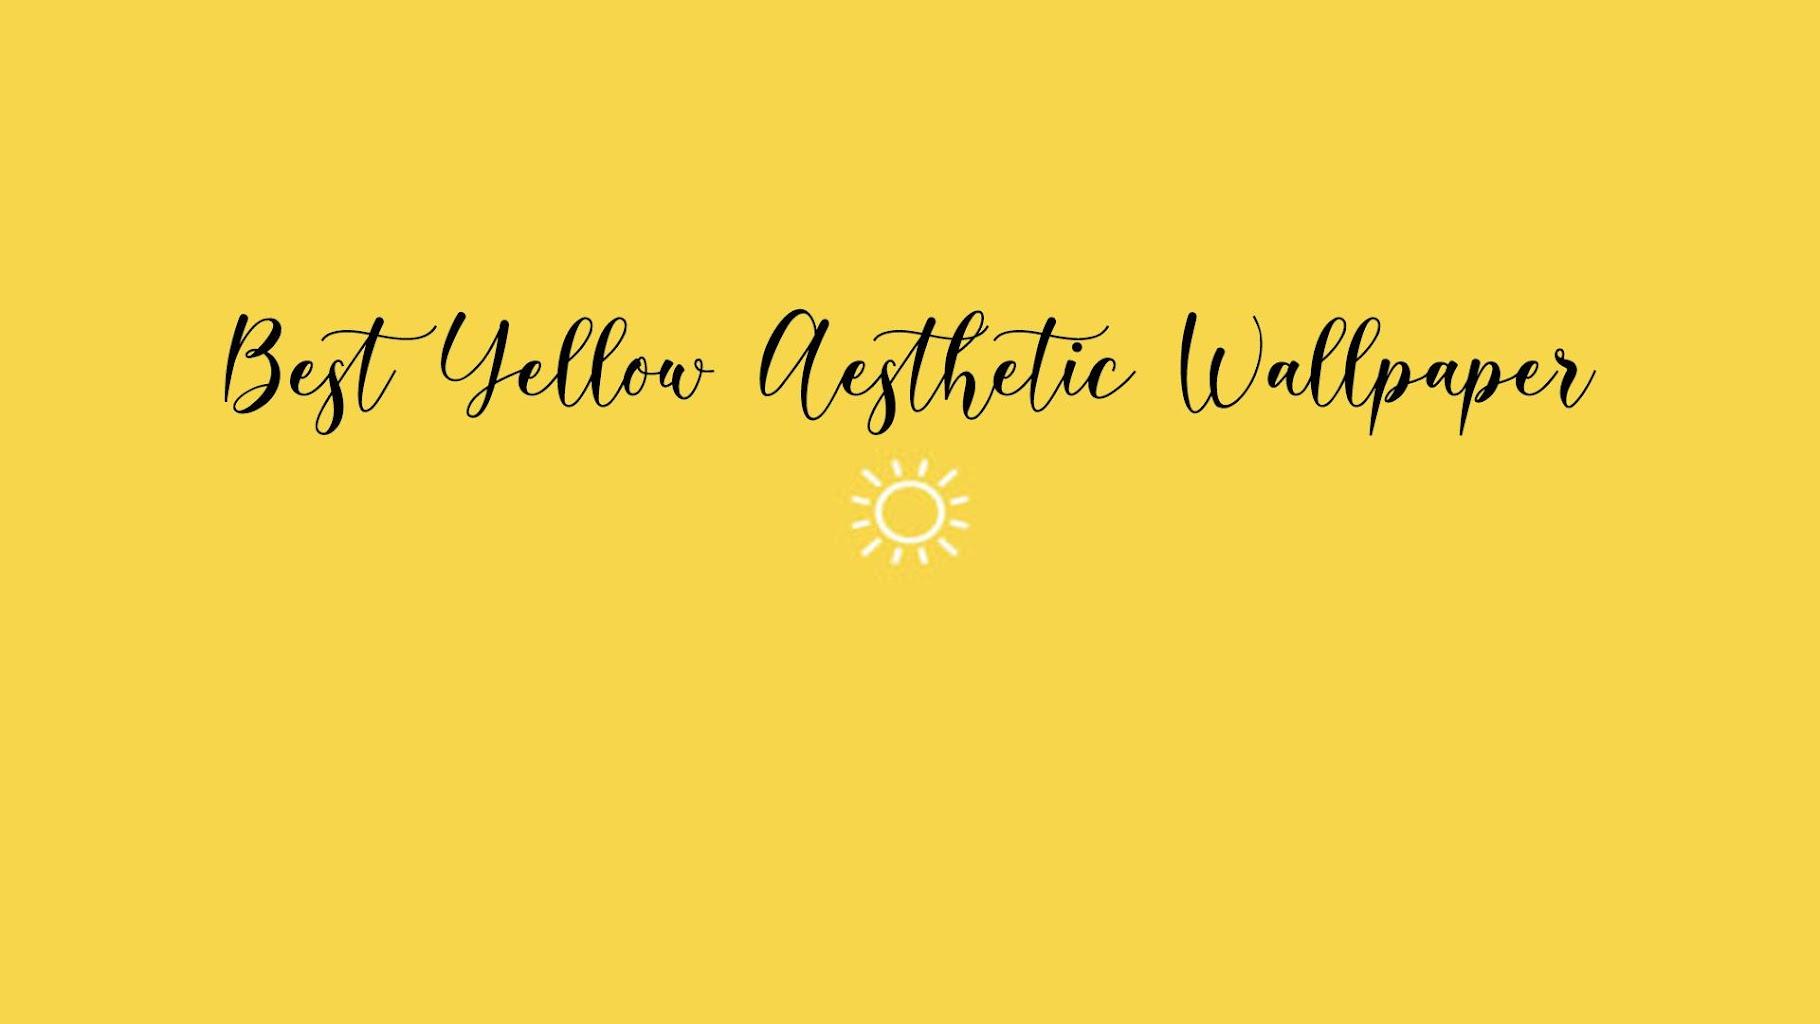 cAviEmZEEtdOVaUrCdIzX0aSp03r UemQs joctcMvarniCzcm5wZ2lD71gynP9qBg=h1024 no tmp yellow aesthetic wallpapers apk poster